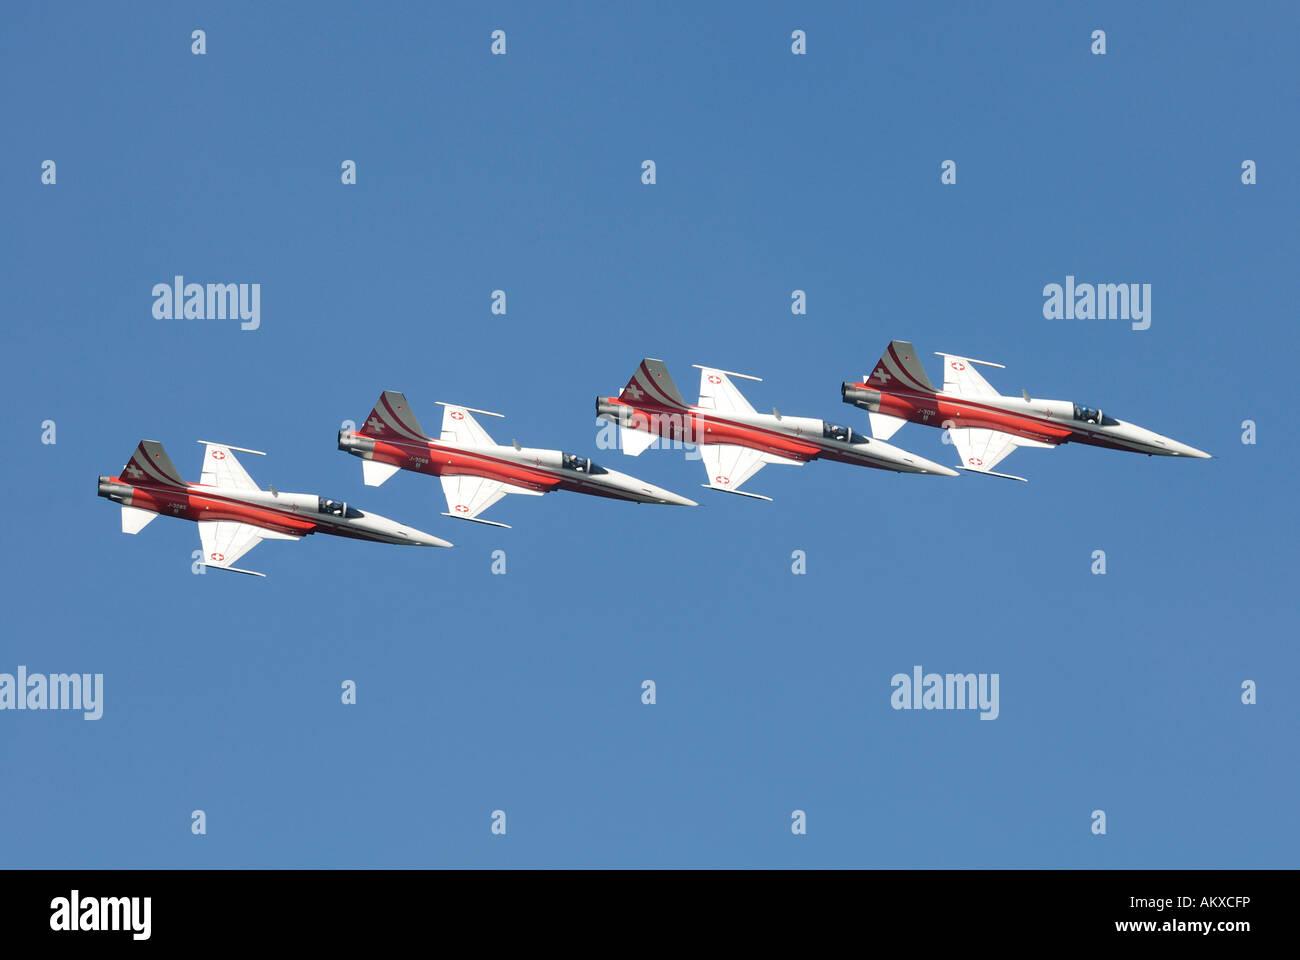 Formation flight with the aerobatic team Patrouille Suisse - Dittingen, Switzerland, Europe. - Stock Image